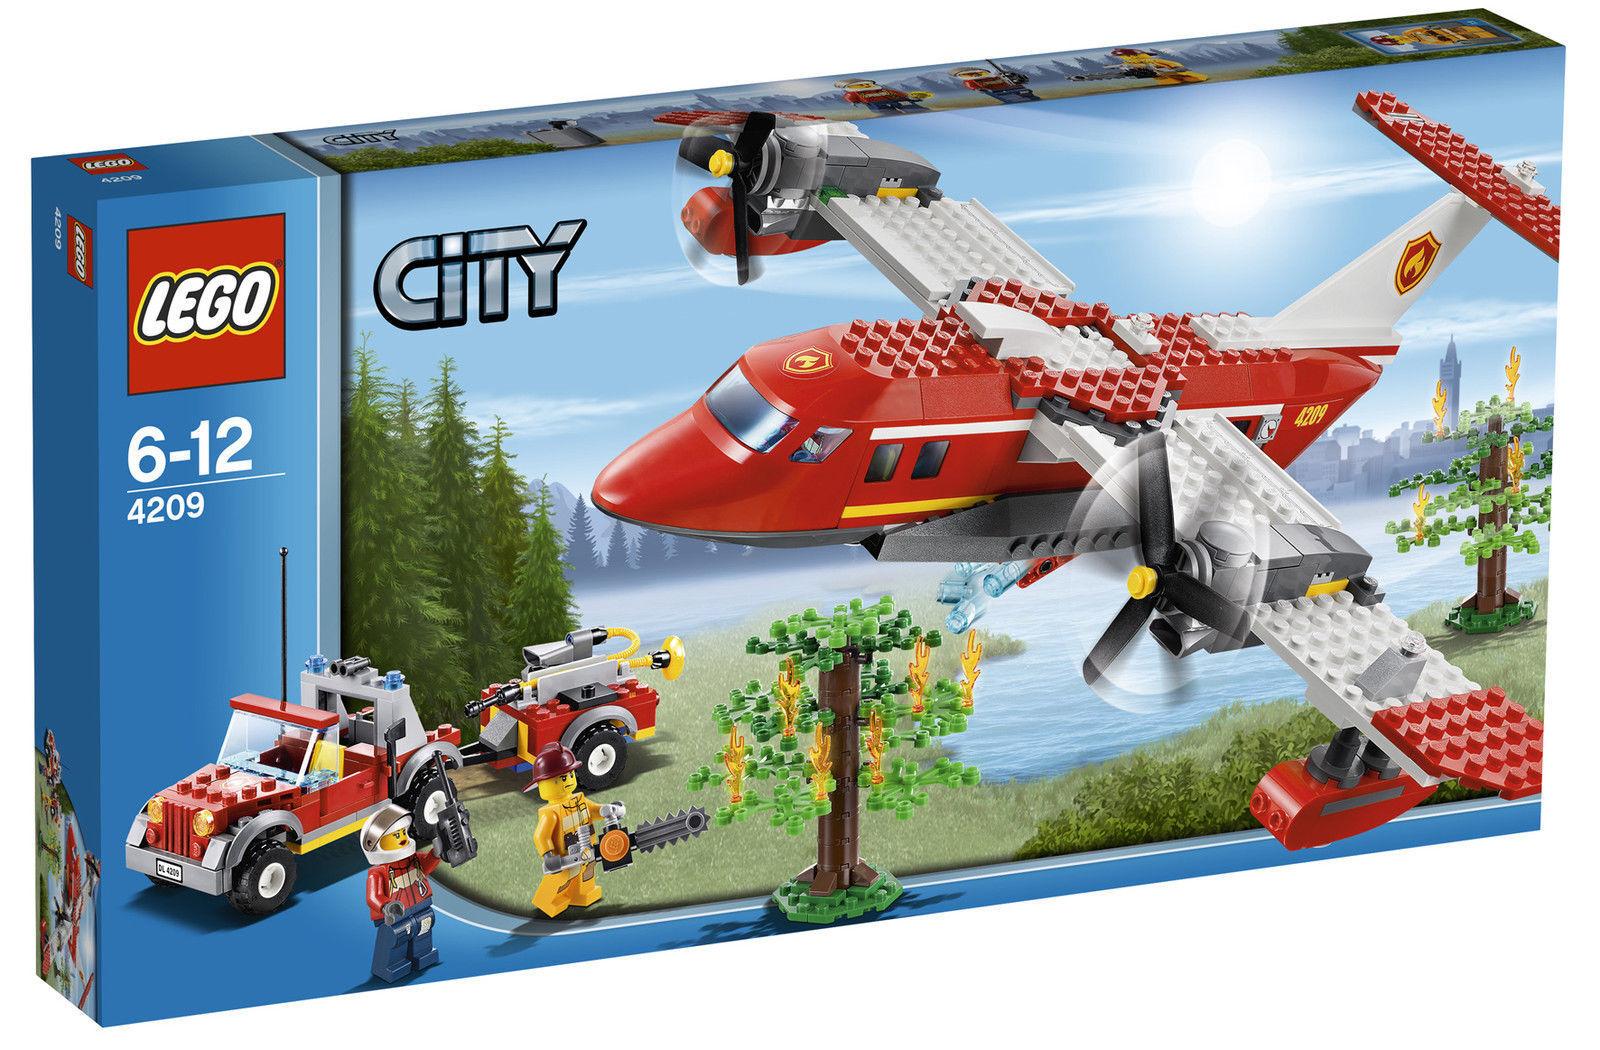 LEGO CITY pompiers-löschflugzeug (4209) NEUF, neuf dans sa Boîte & Scellé